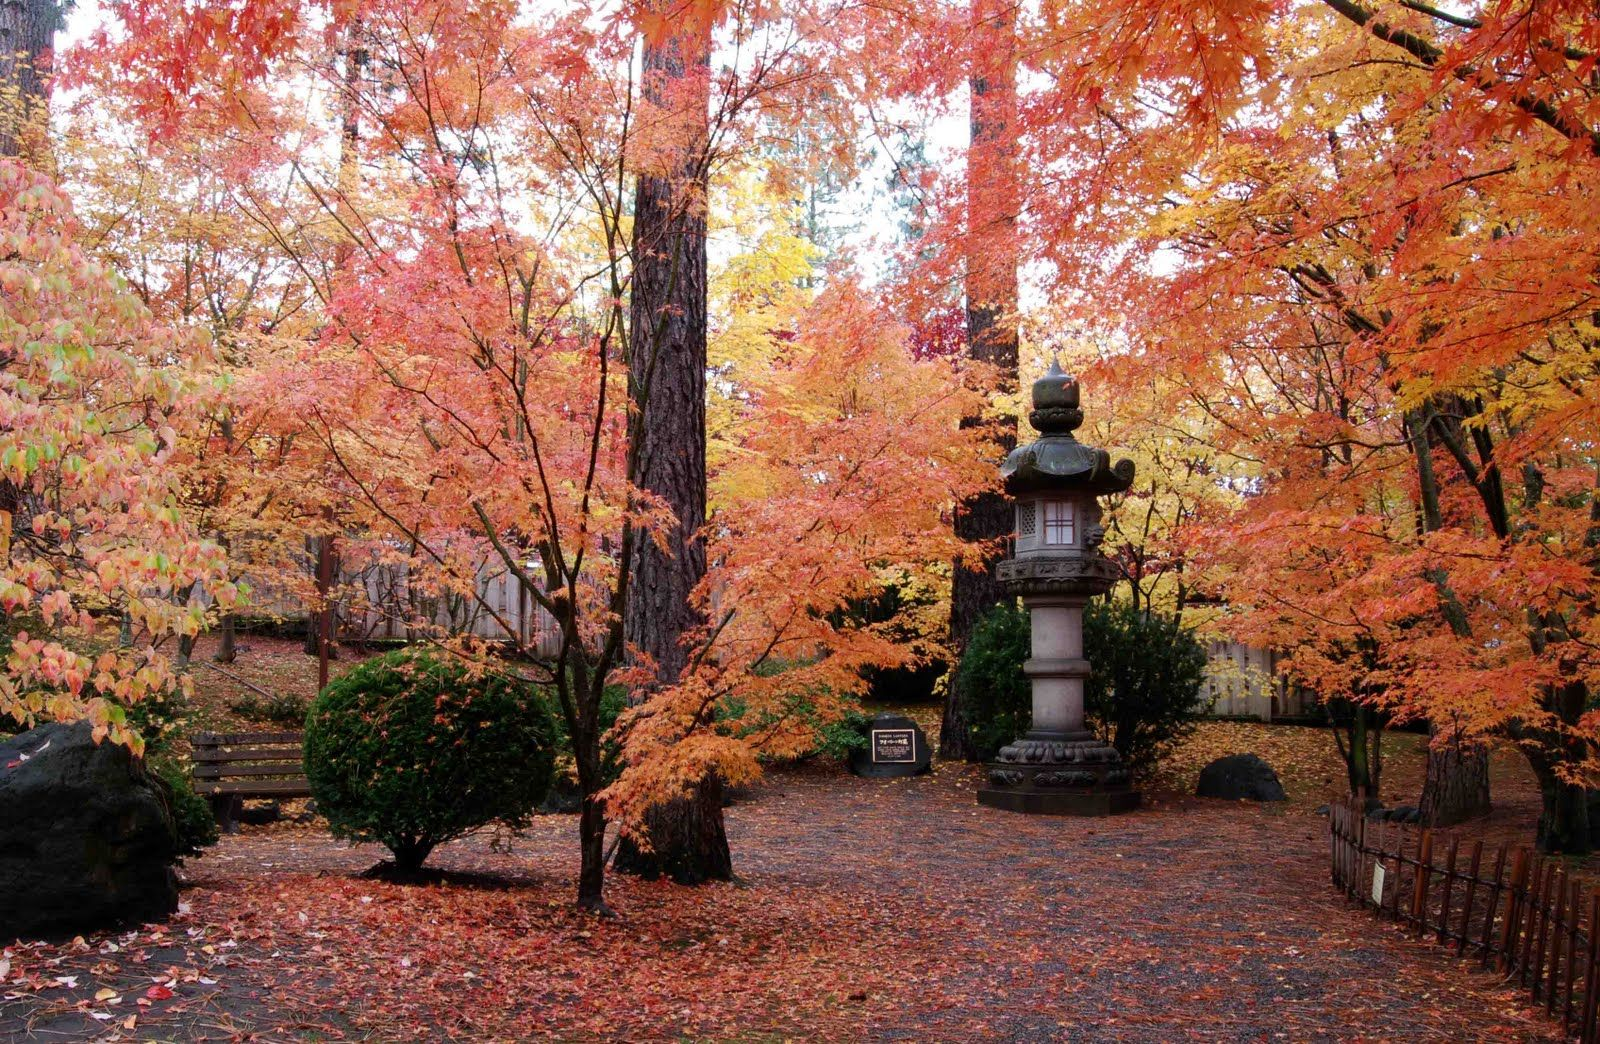 Nishinomiya Tsutakawa Japanese Garden Manito Park